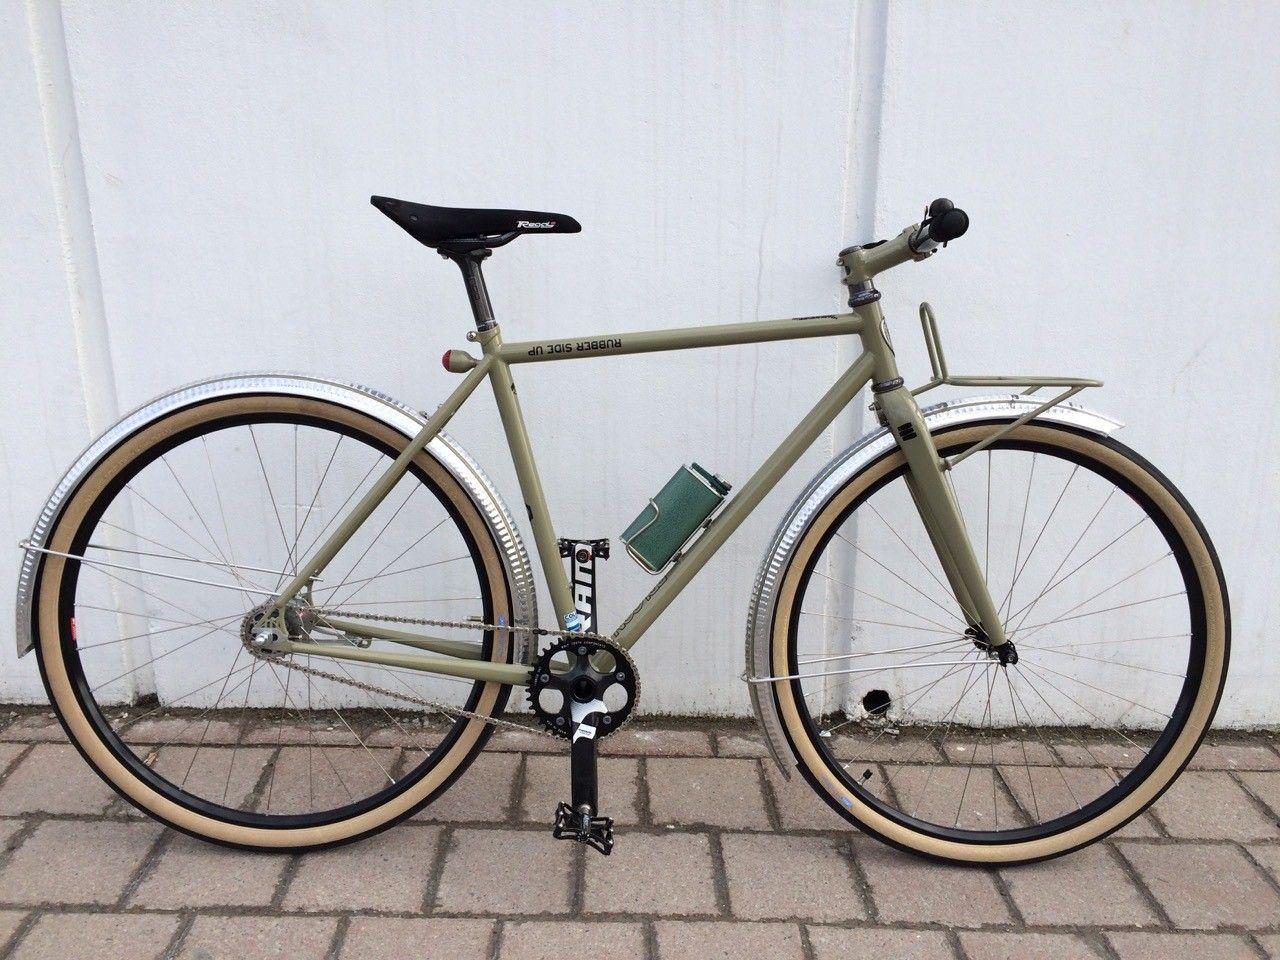 Cool Sport Racing Bikes By Chavi Sharma: An Urban Racer-Esque All-City Nature Boy Zona